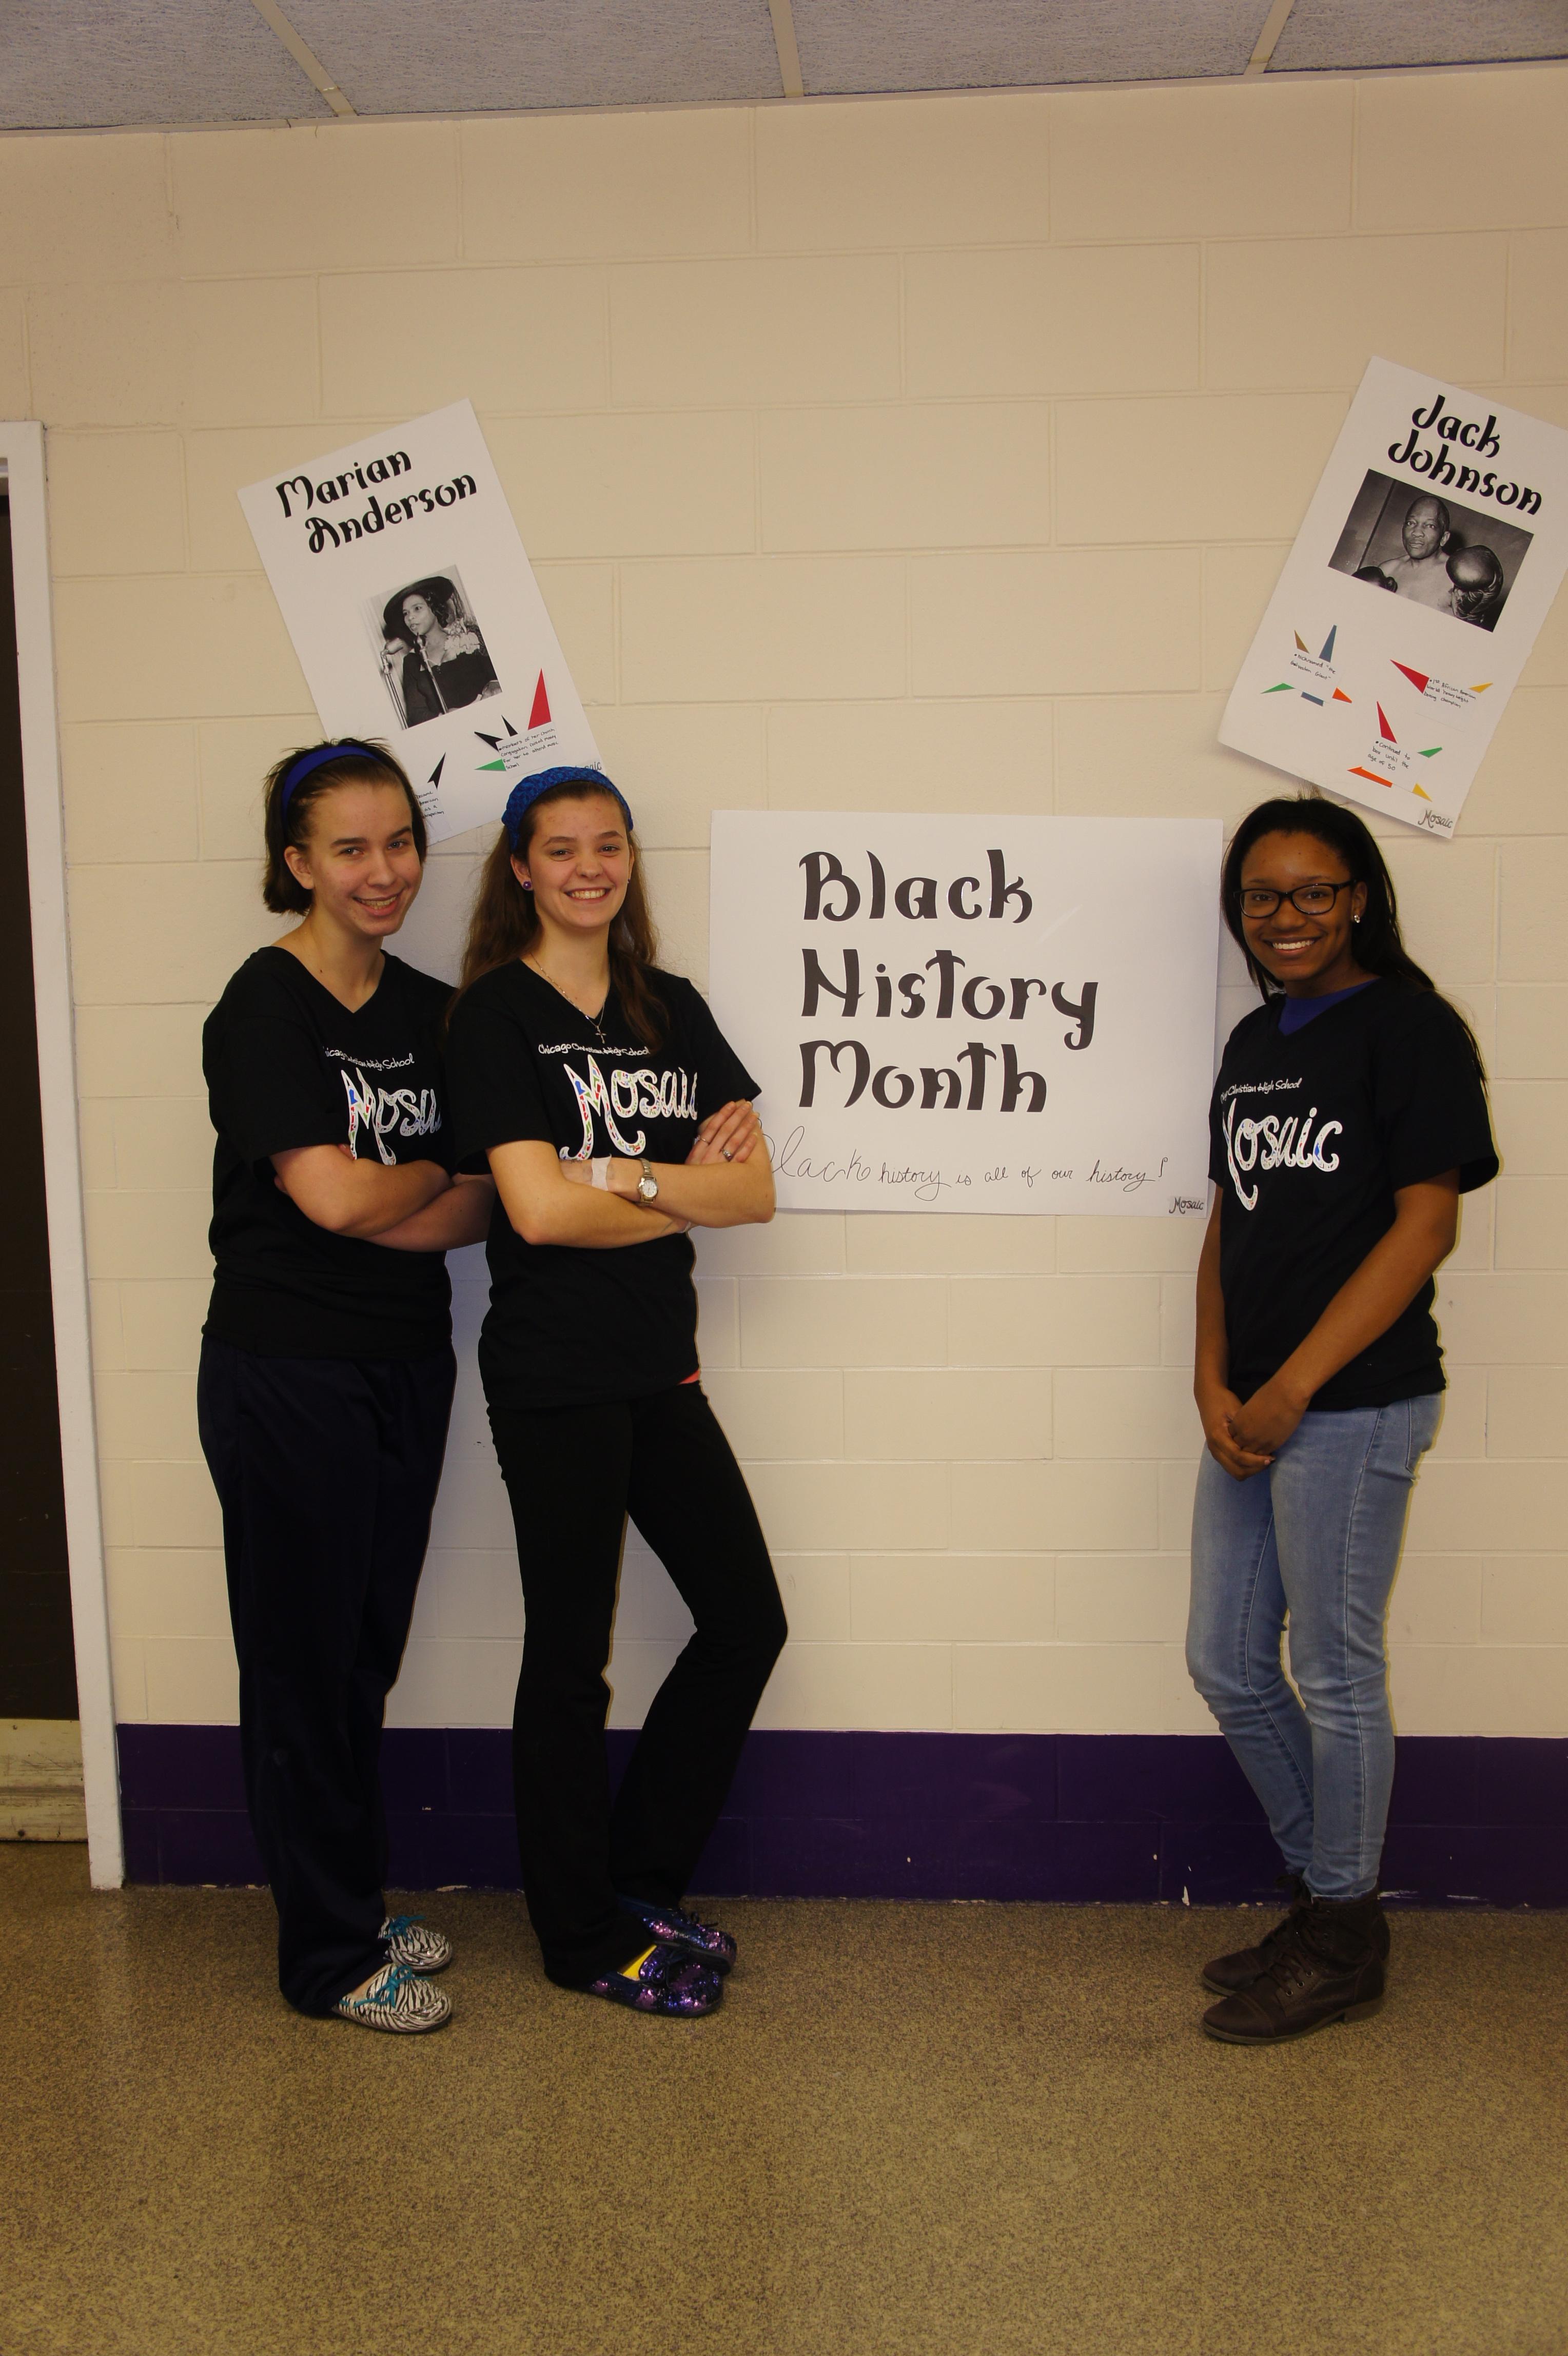 Shirt design history - Mosaic Diversity Club Pride During Black History Month T Shirt Photo